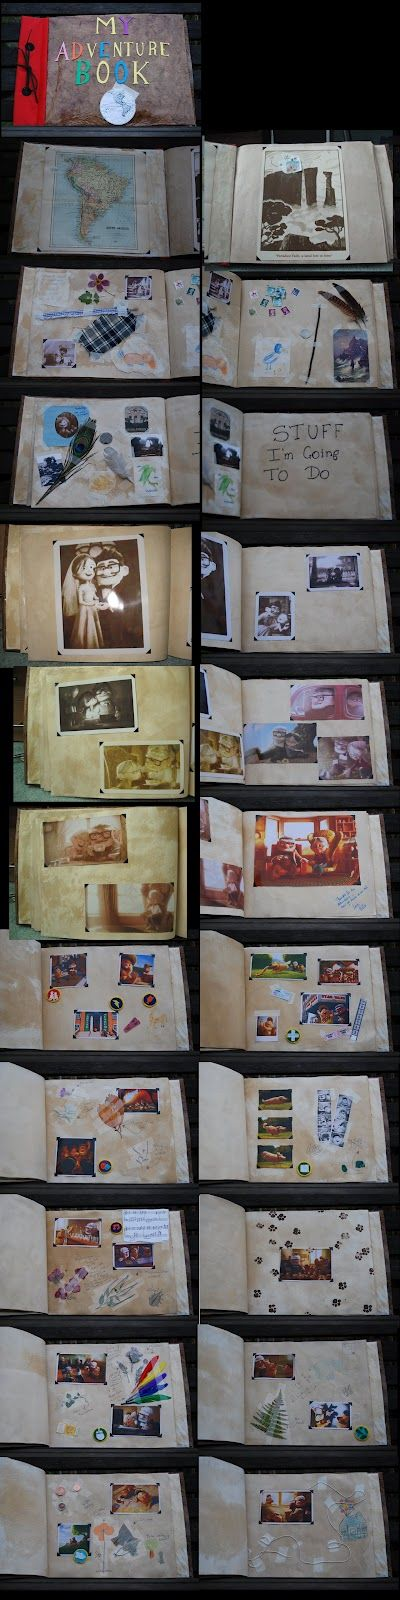 Sasaki Time: Amazing Handmade 'My Adventure Book' from UP!